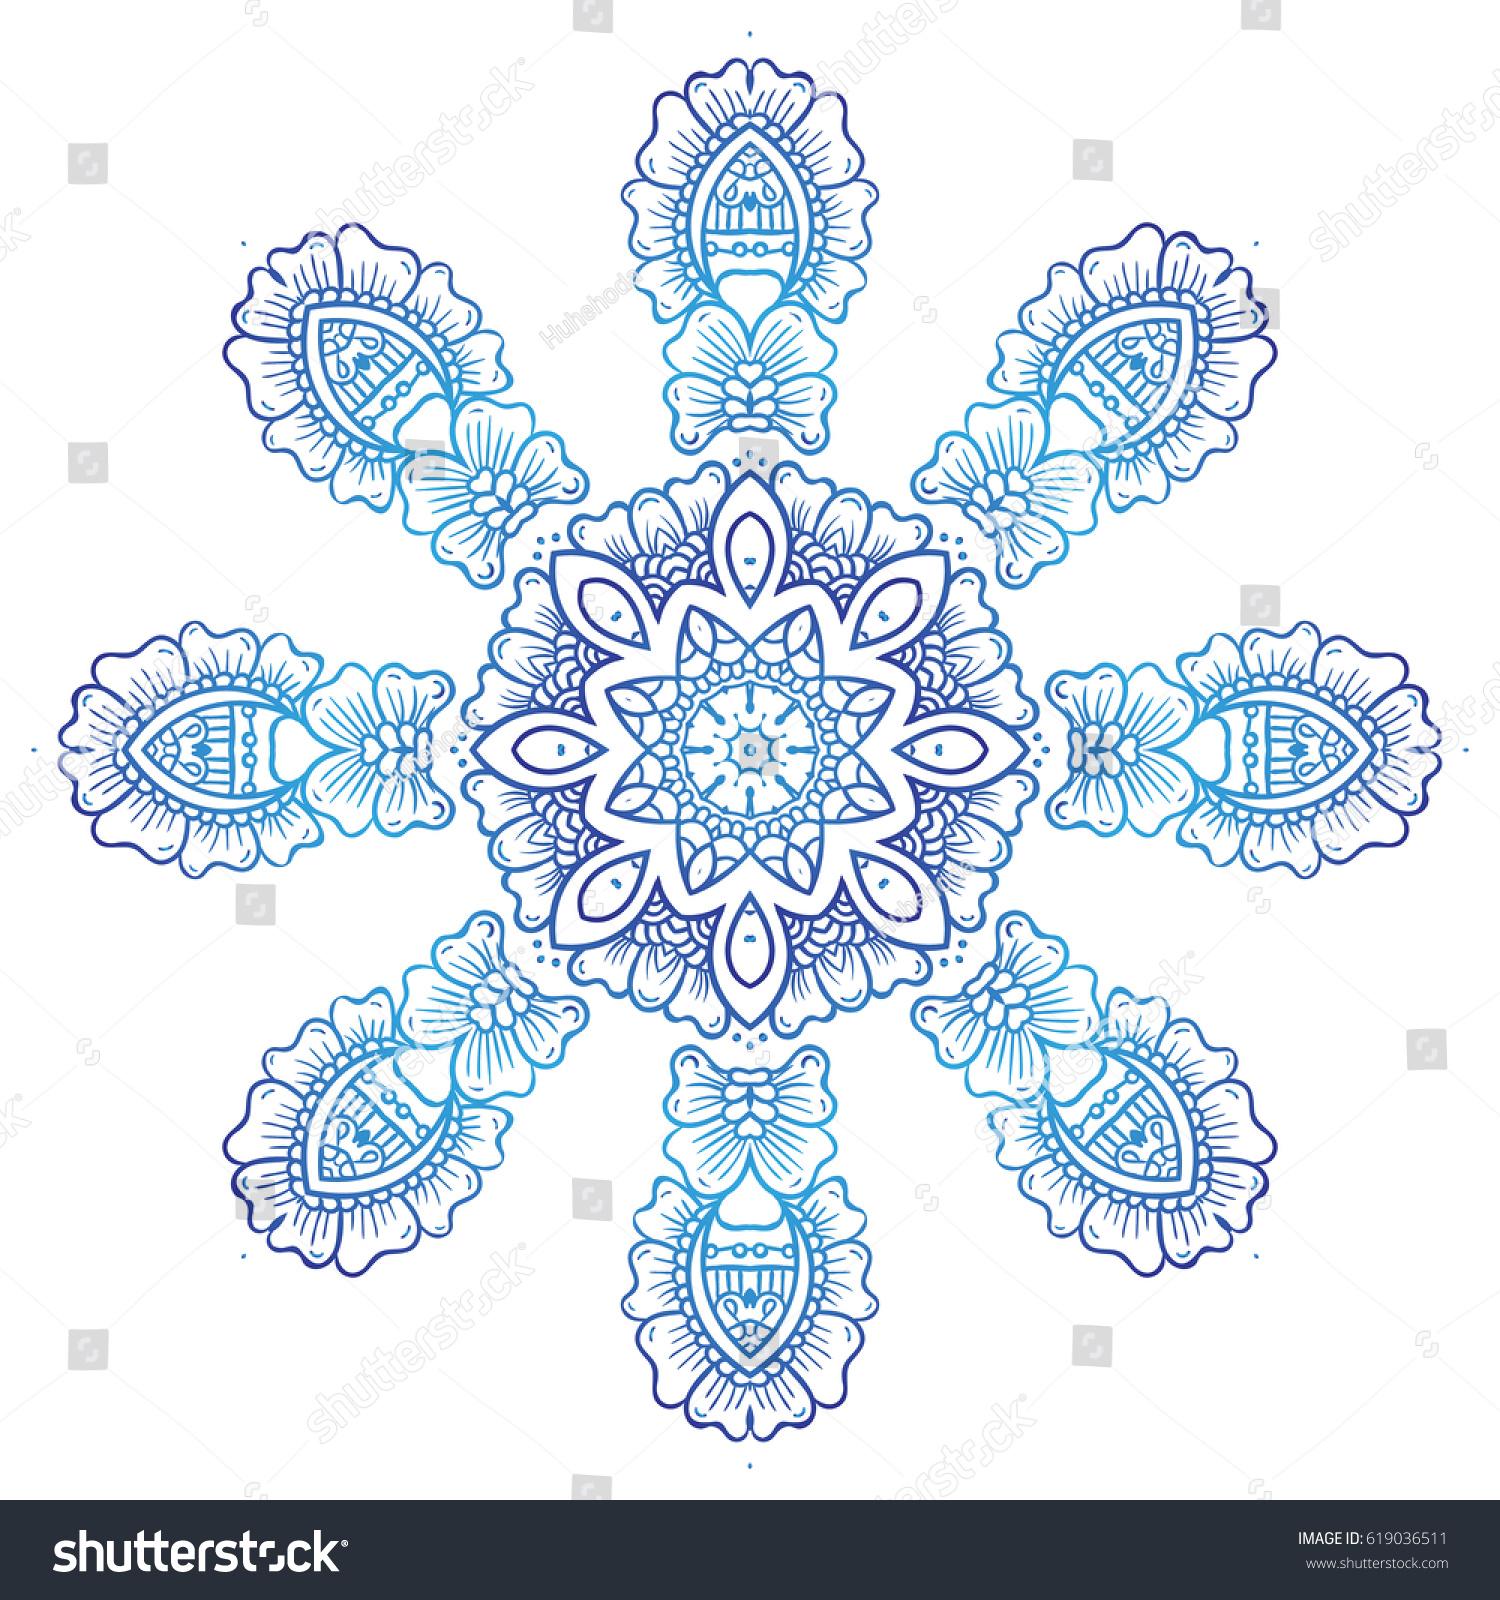 d1b6bf1a0 Circular floral ornament Mehndi Henna Tattoo Mandala, Yantra blue. Vintage  vector banner frame card